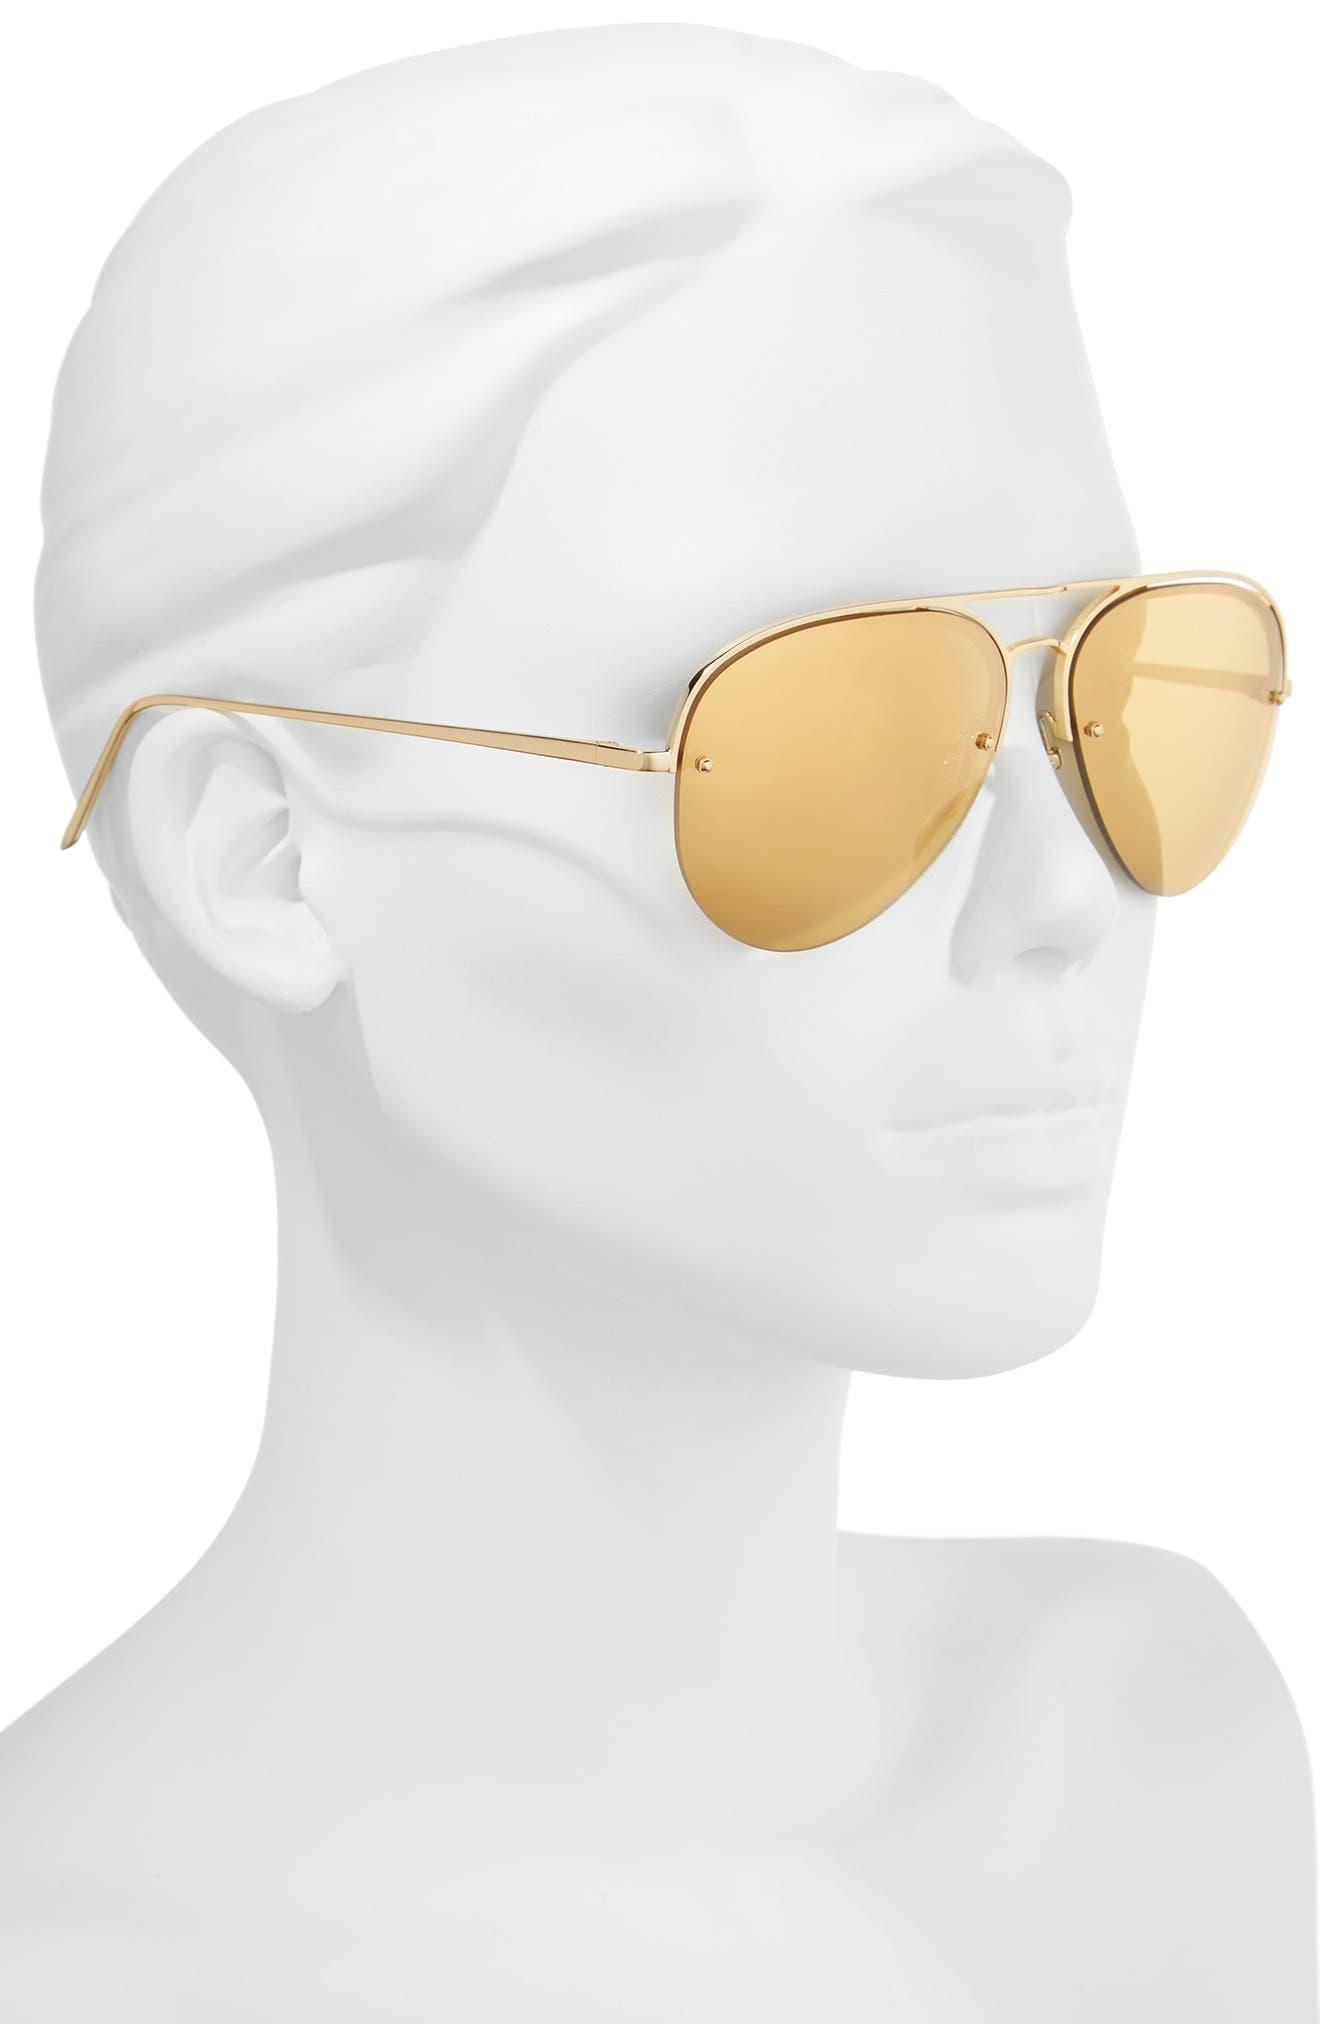 60mm Mirrored 22 Karat Gold Aviator Sunglasses,                             Alternate thumbnail 2, color,                             YELLOW GOLD/ GOLD